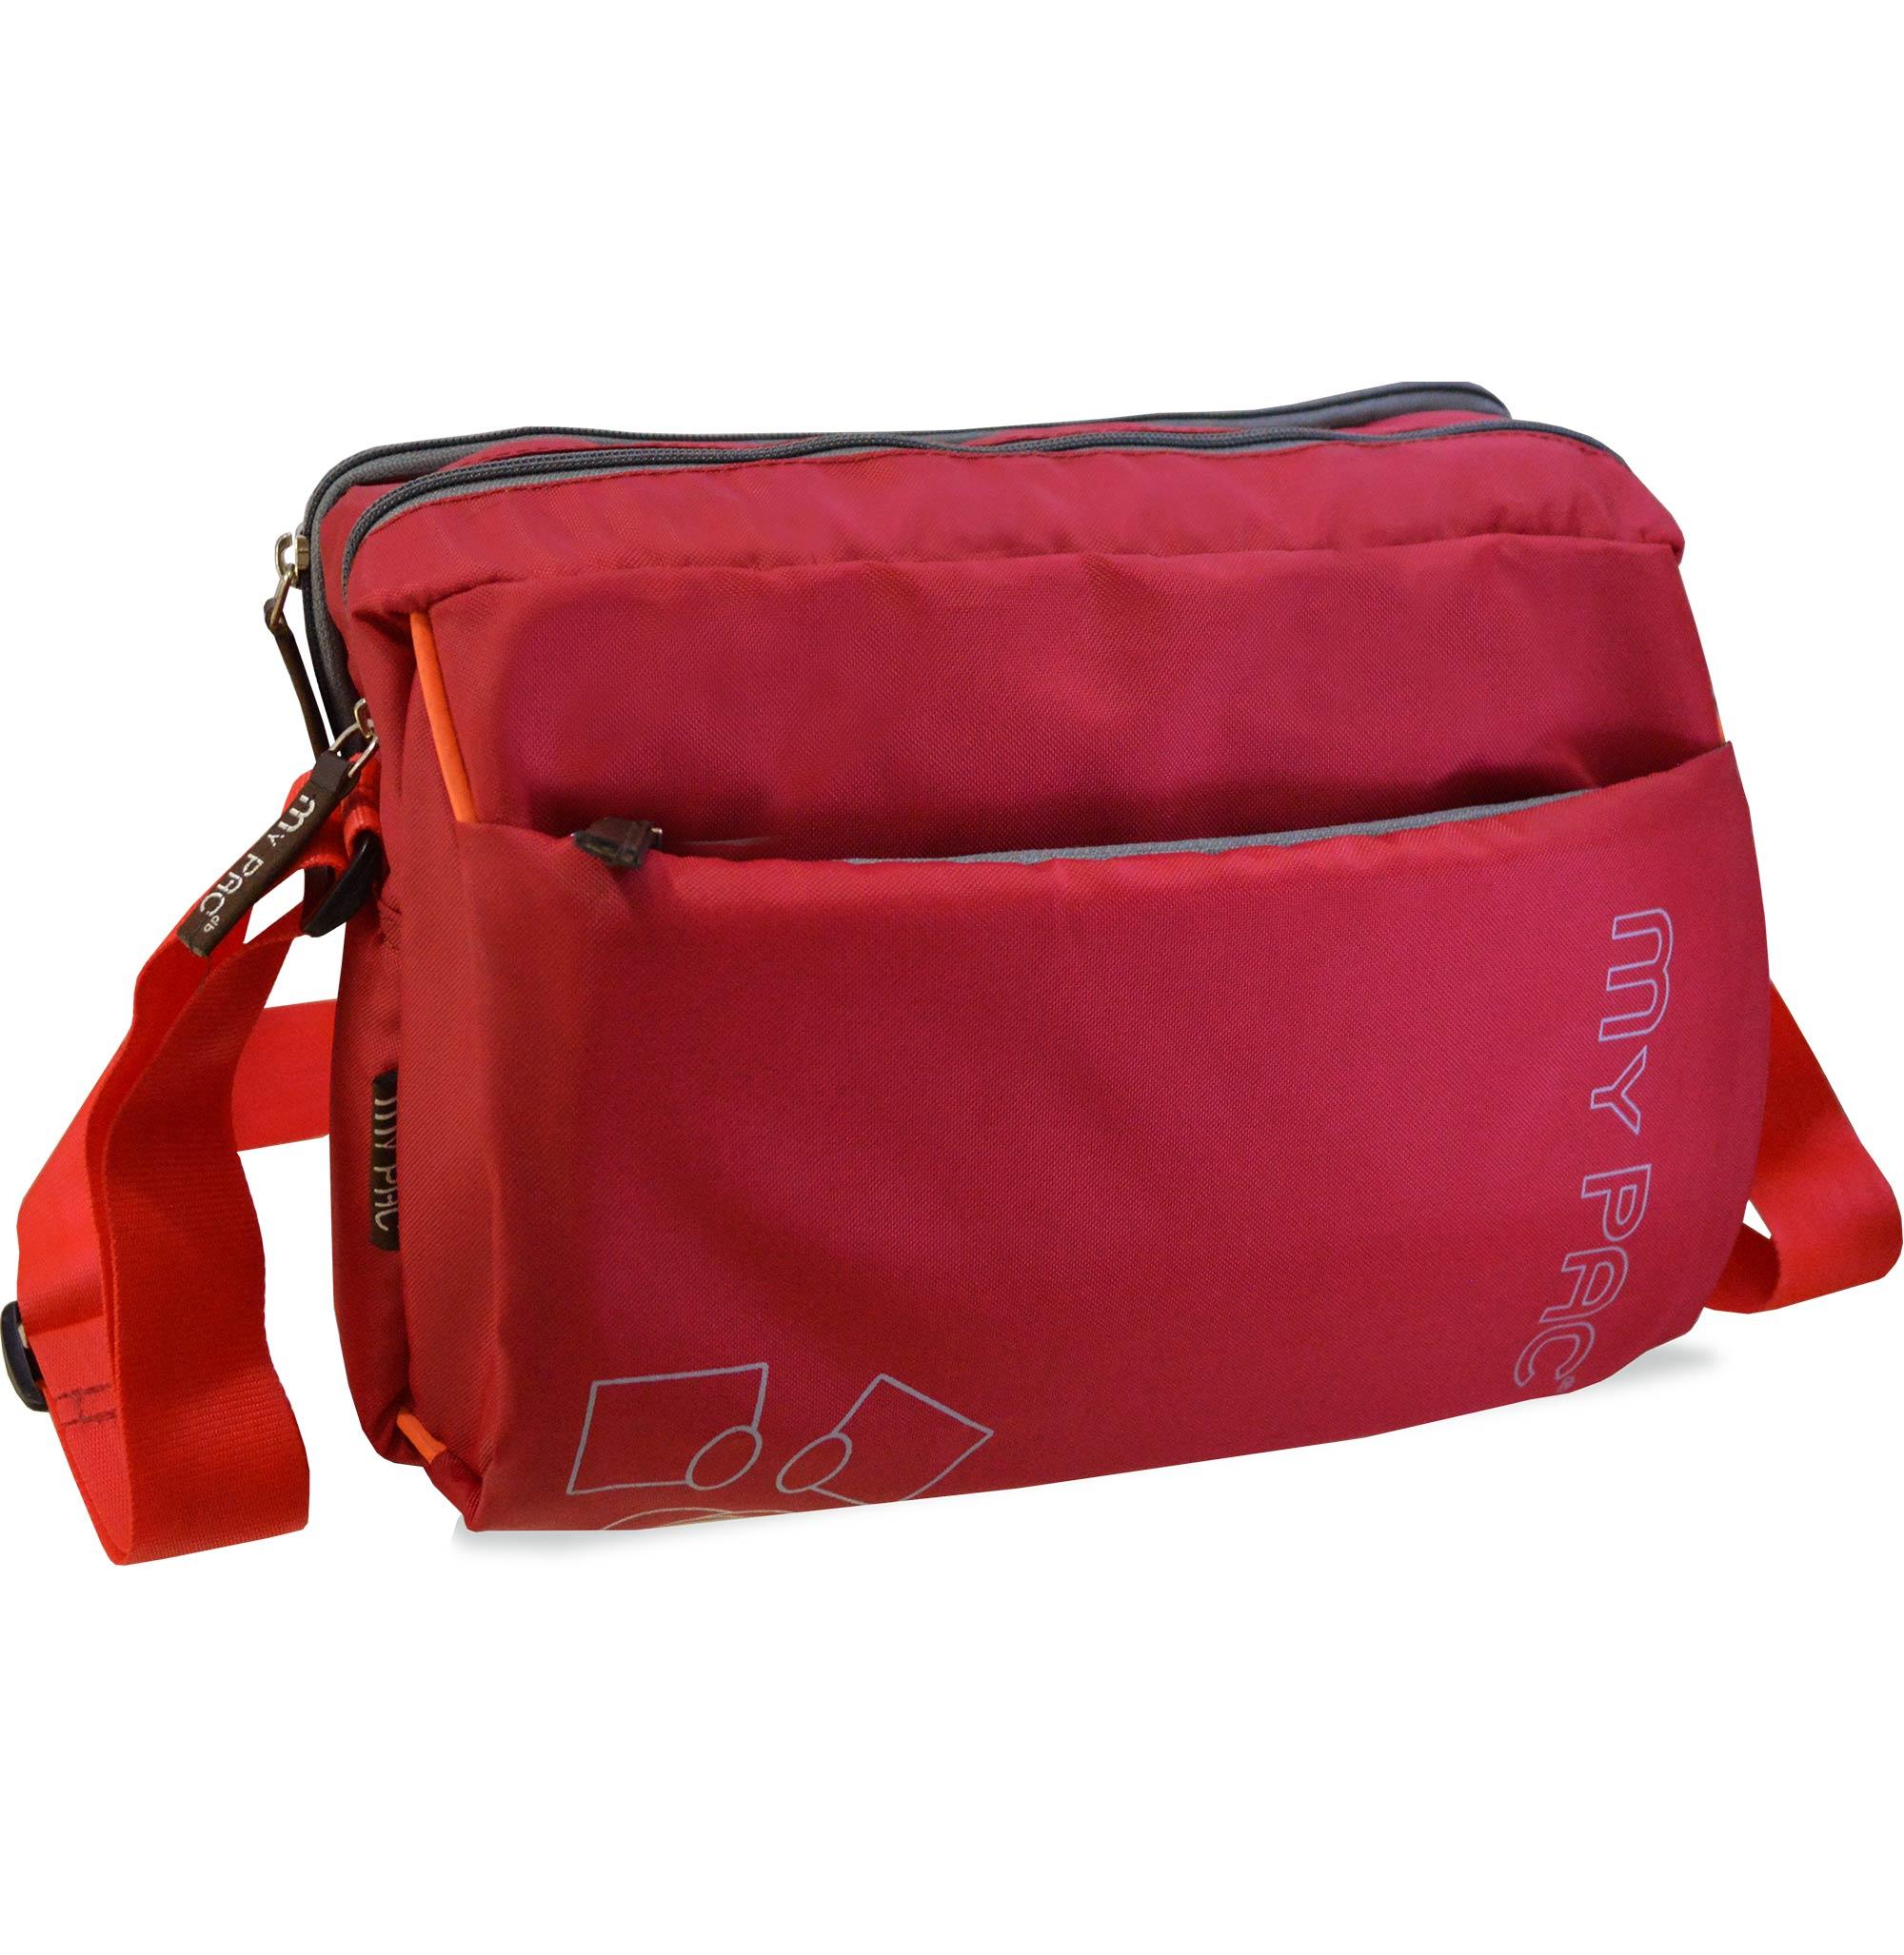 Mypac Vivaa Polyester Crossbody Ipad Camera Travel Sling Bag Red C11584 3